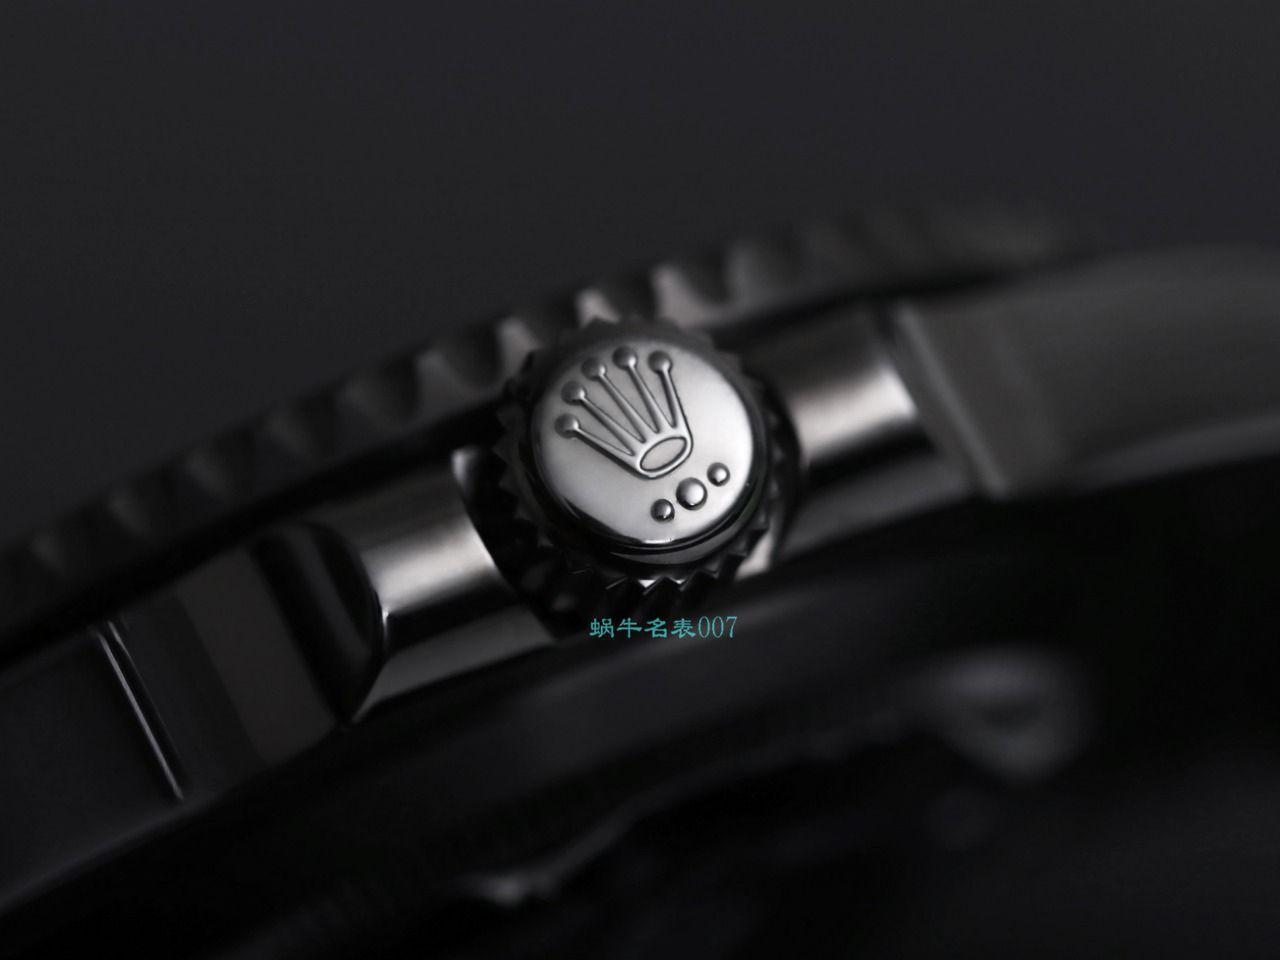 V9厂劳力士ROLEX水鬼BLAKEN SUBMARINER DATE 116610LV同款曜黑改装版 / R670